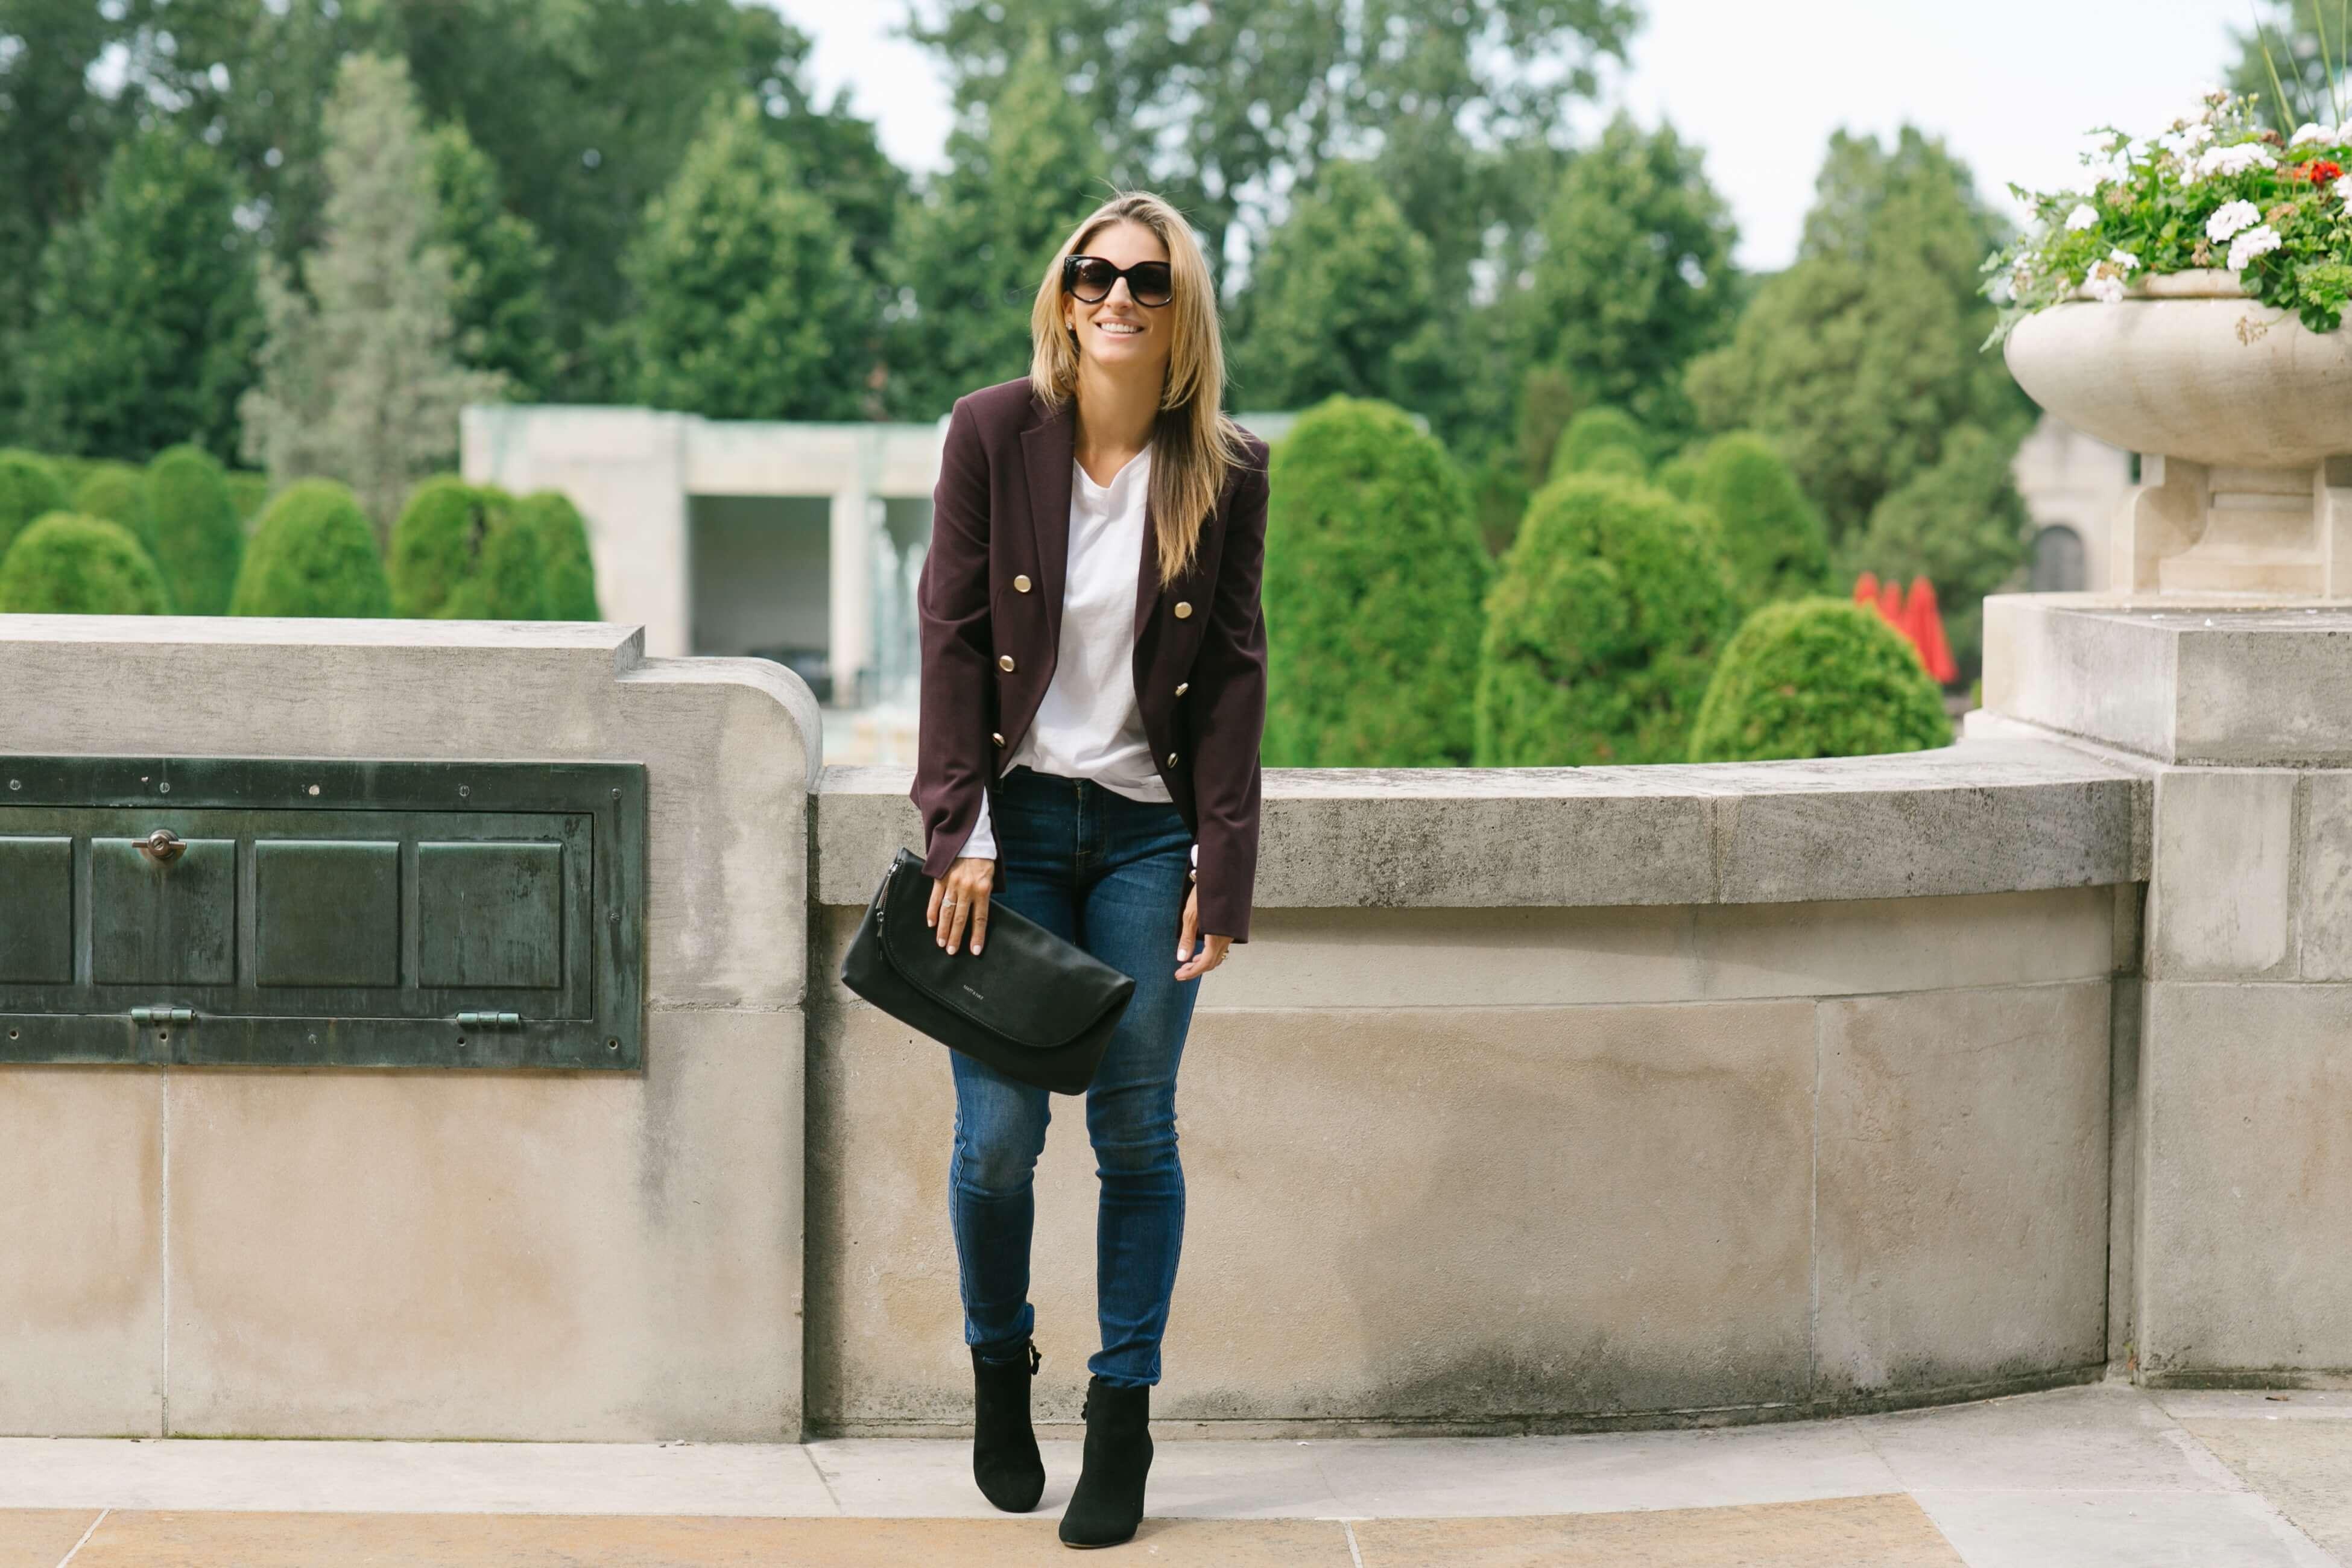 Falls basics - Theory military blazer, skinny jeans, black booties, Saks OFF 5TH, sparkleshinylove Mandy Furnis